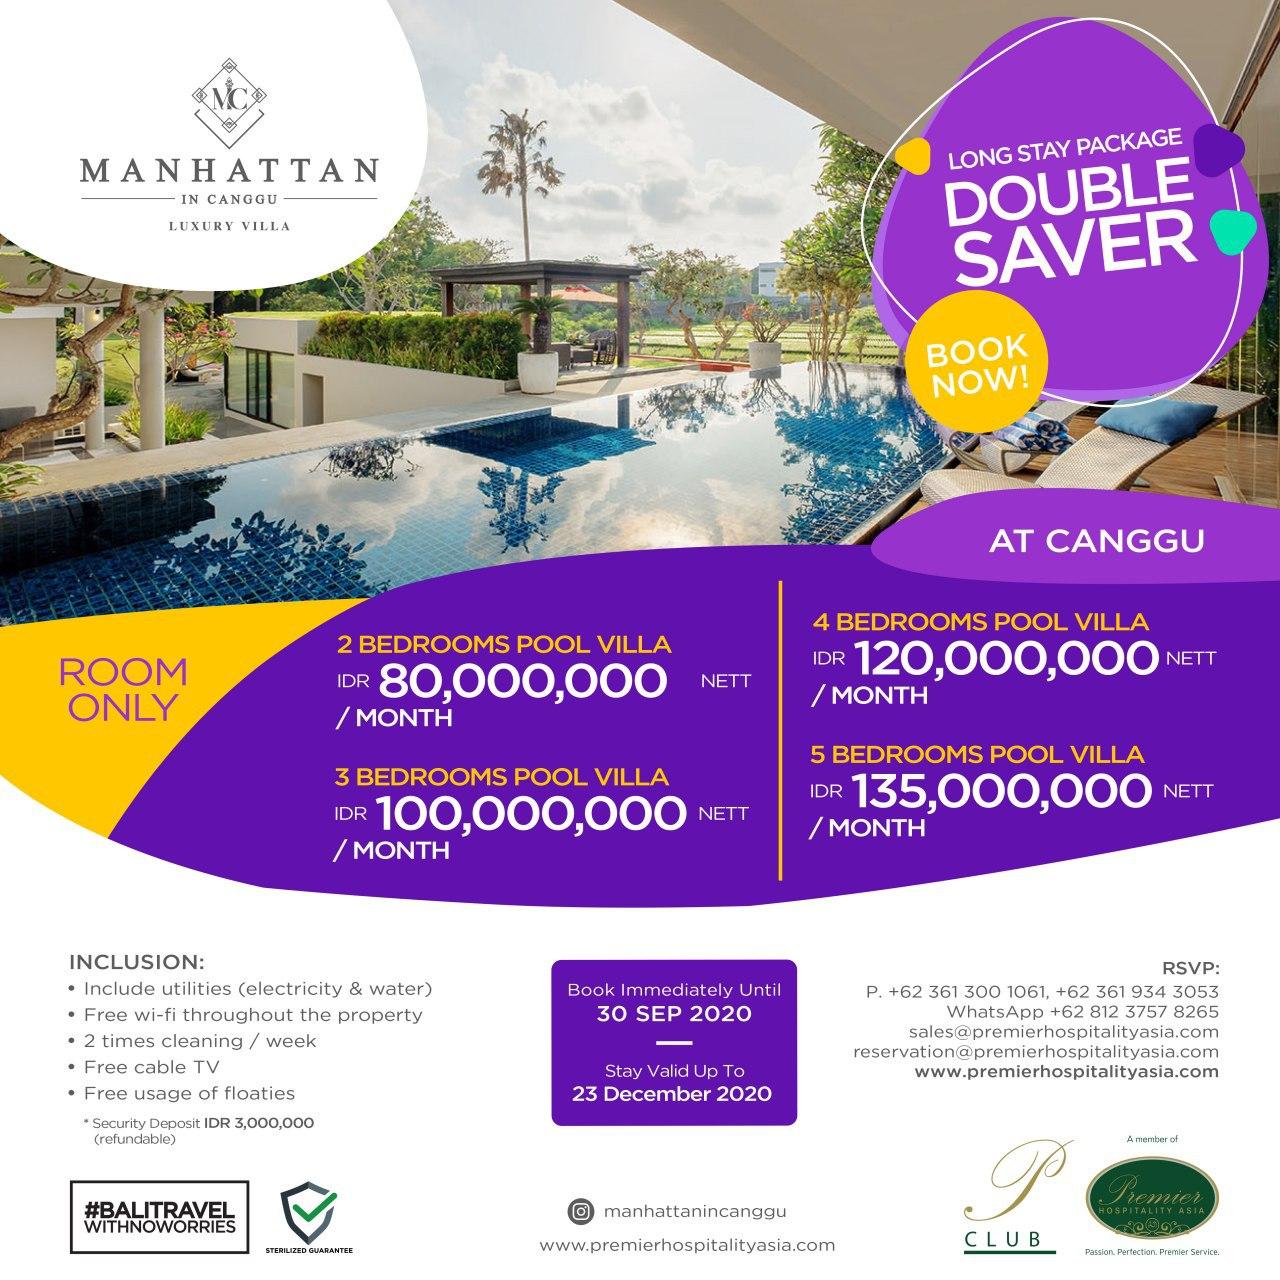 manhattan-in-canggu-luxury-wedding-villa-bali-5-bedroom-long-stay-monthly-rental